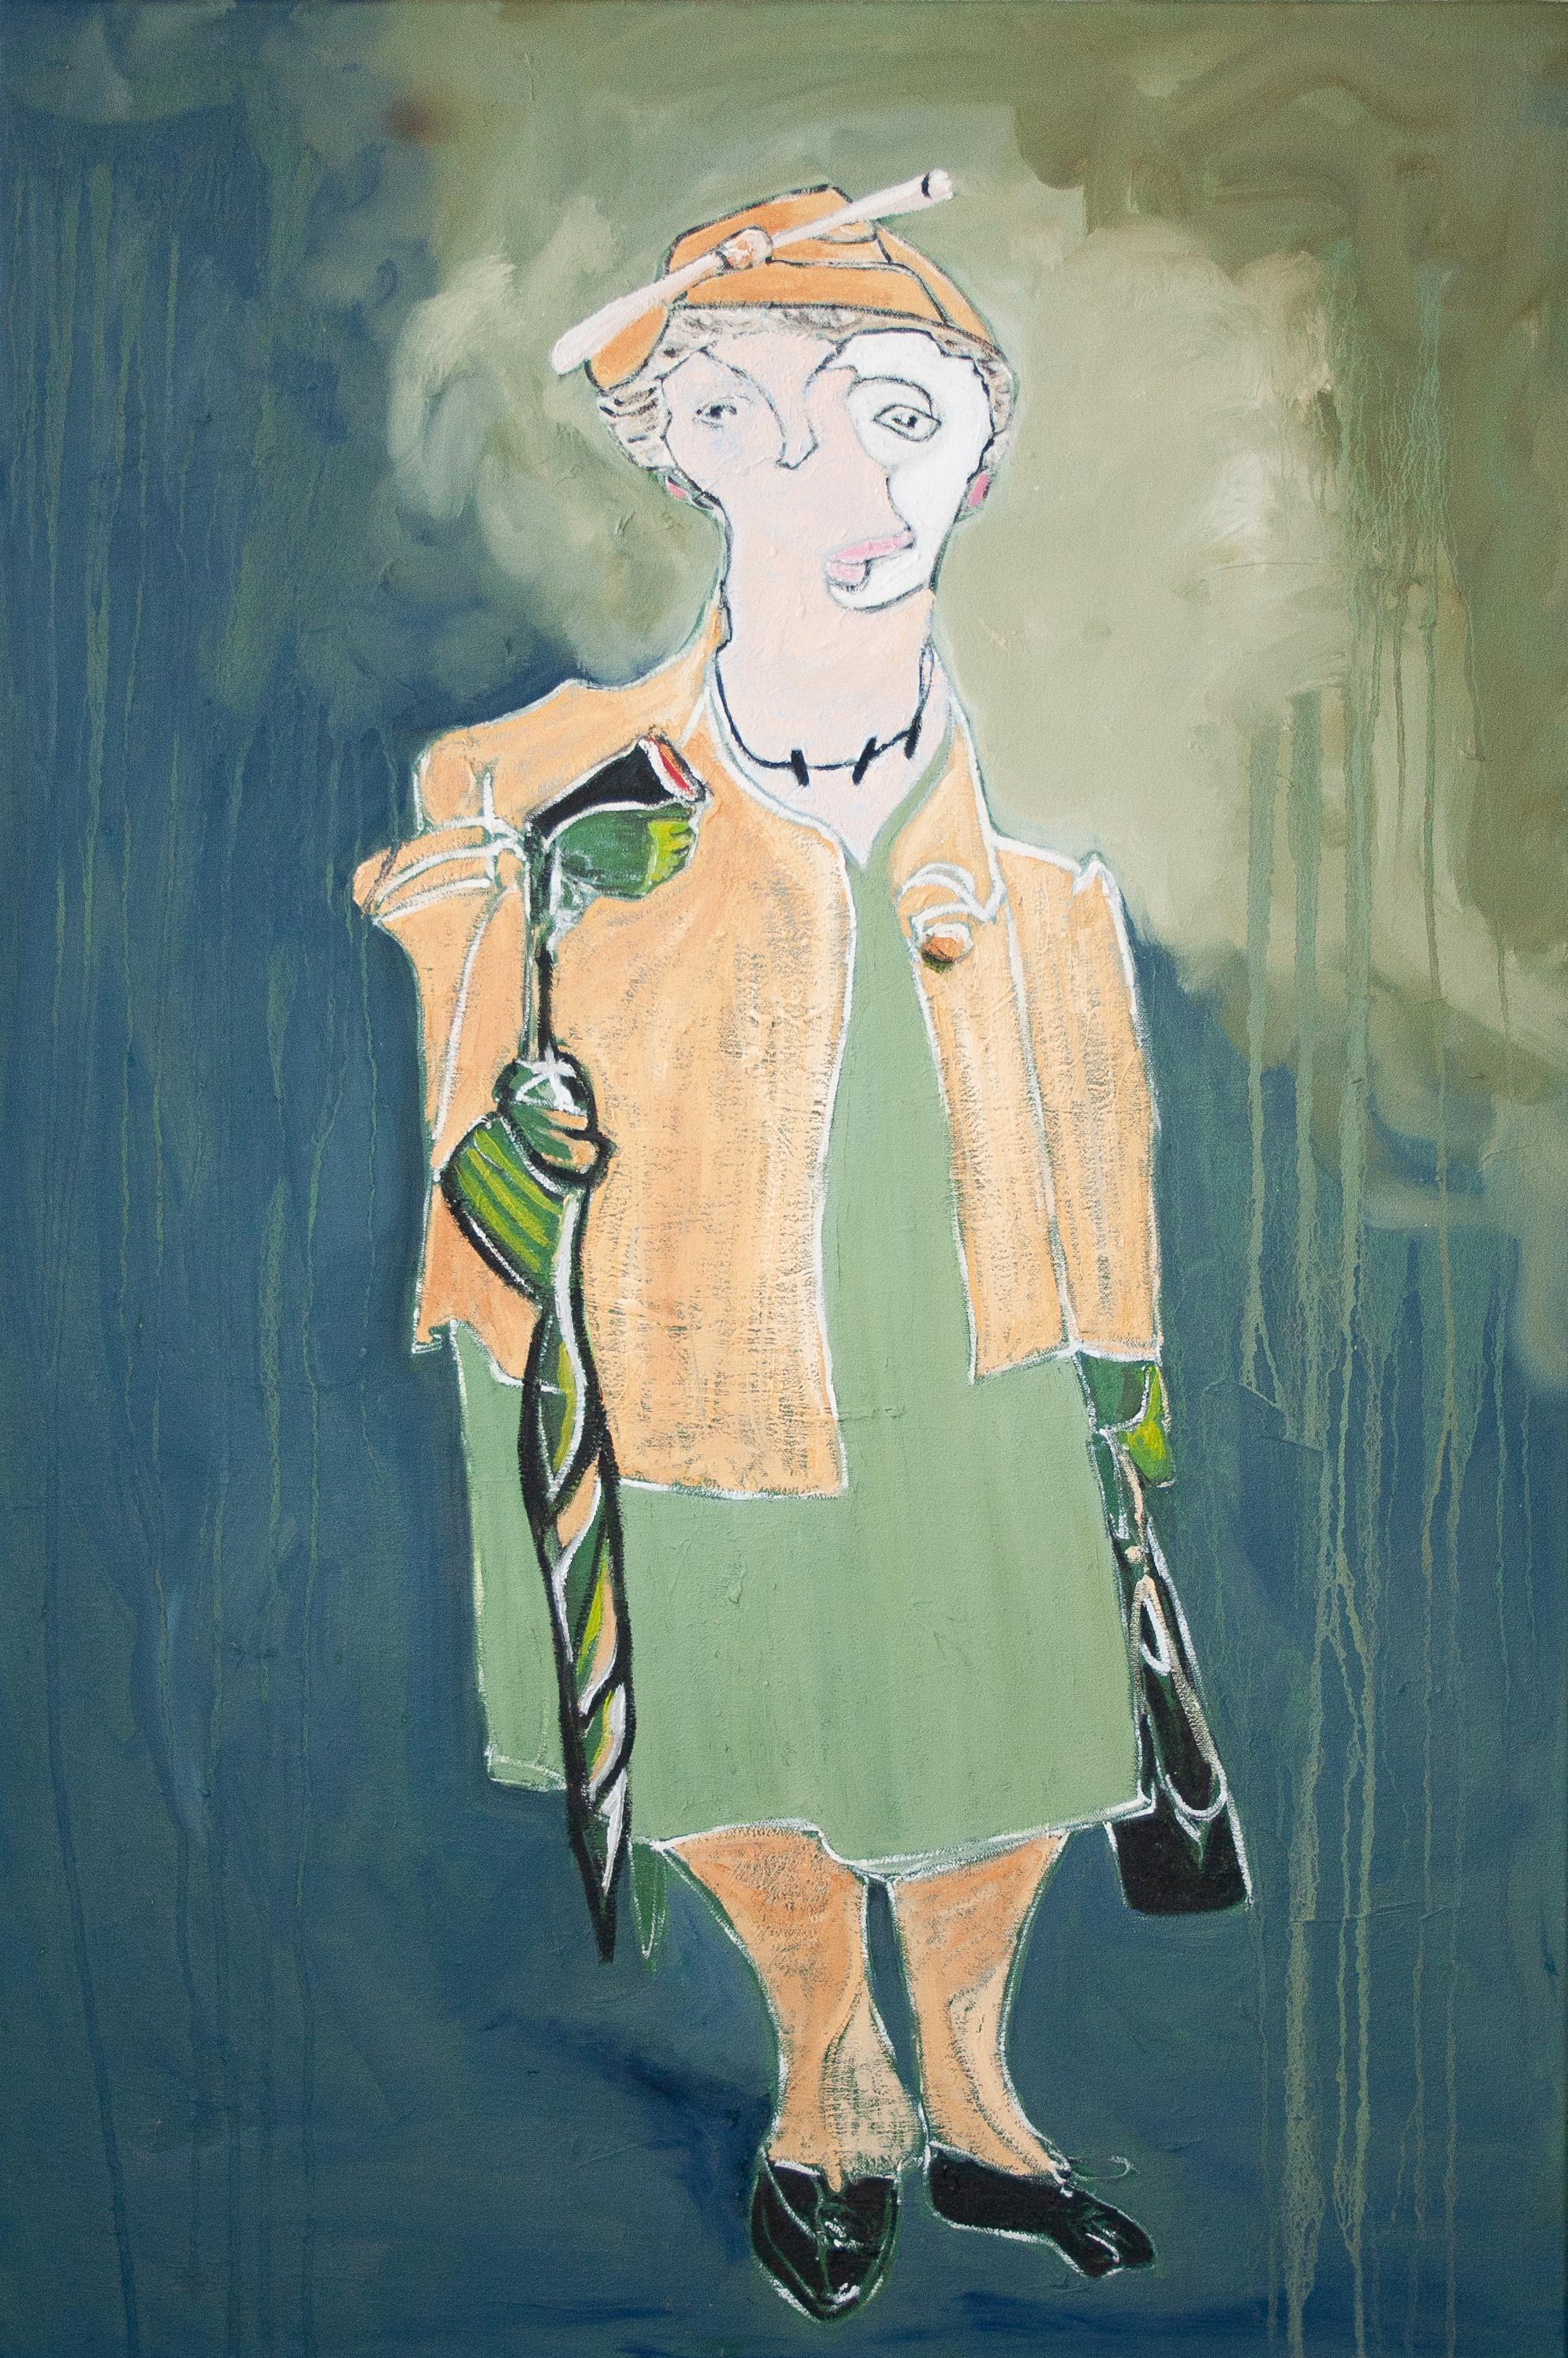 Blind Contour Homage: Shepherd by Marlene Lowden